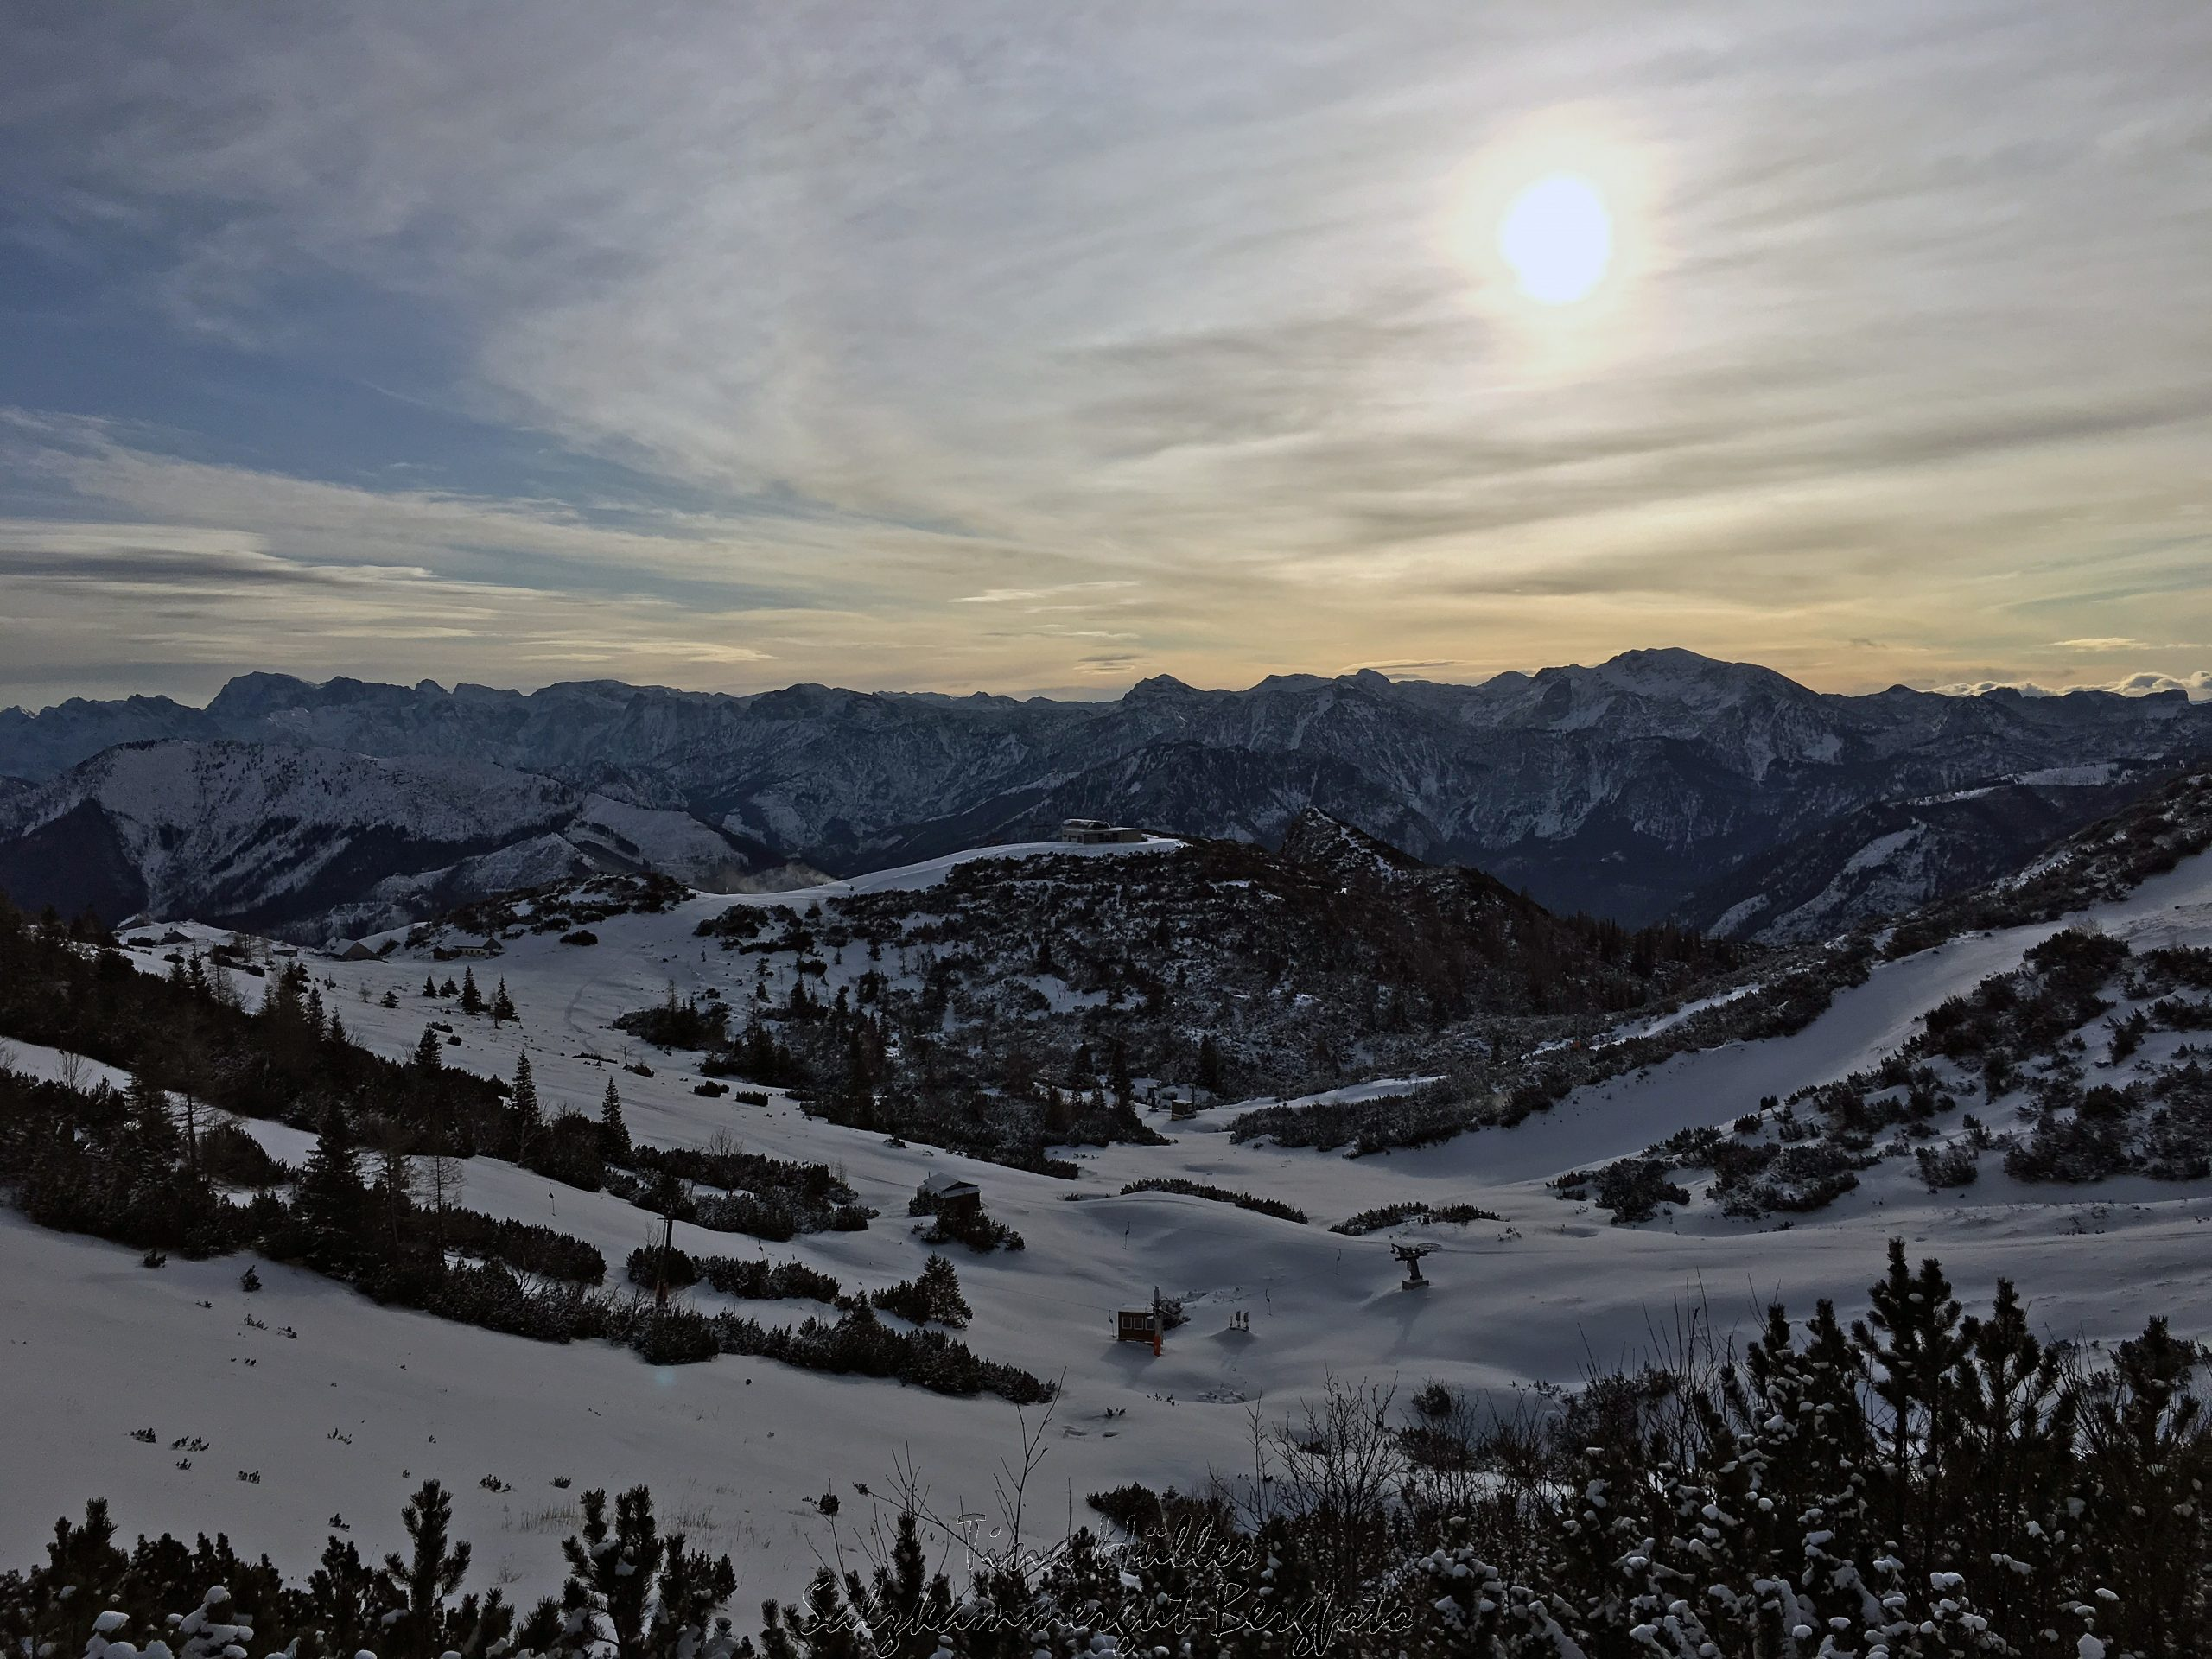 Skitour Helmeskogel